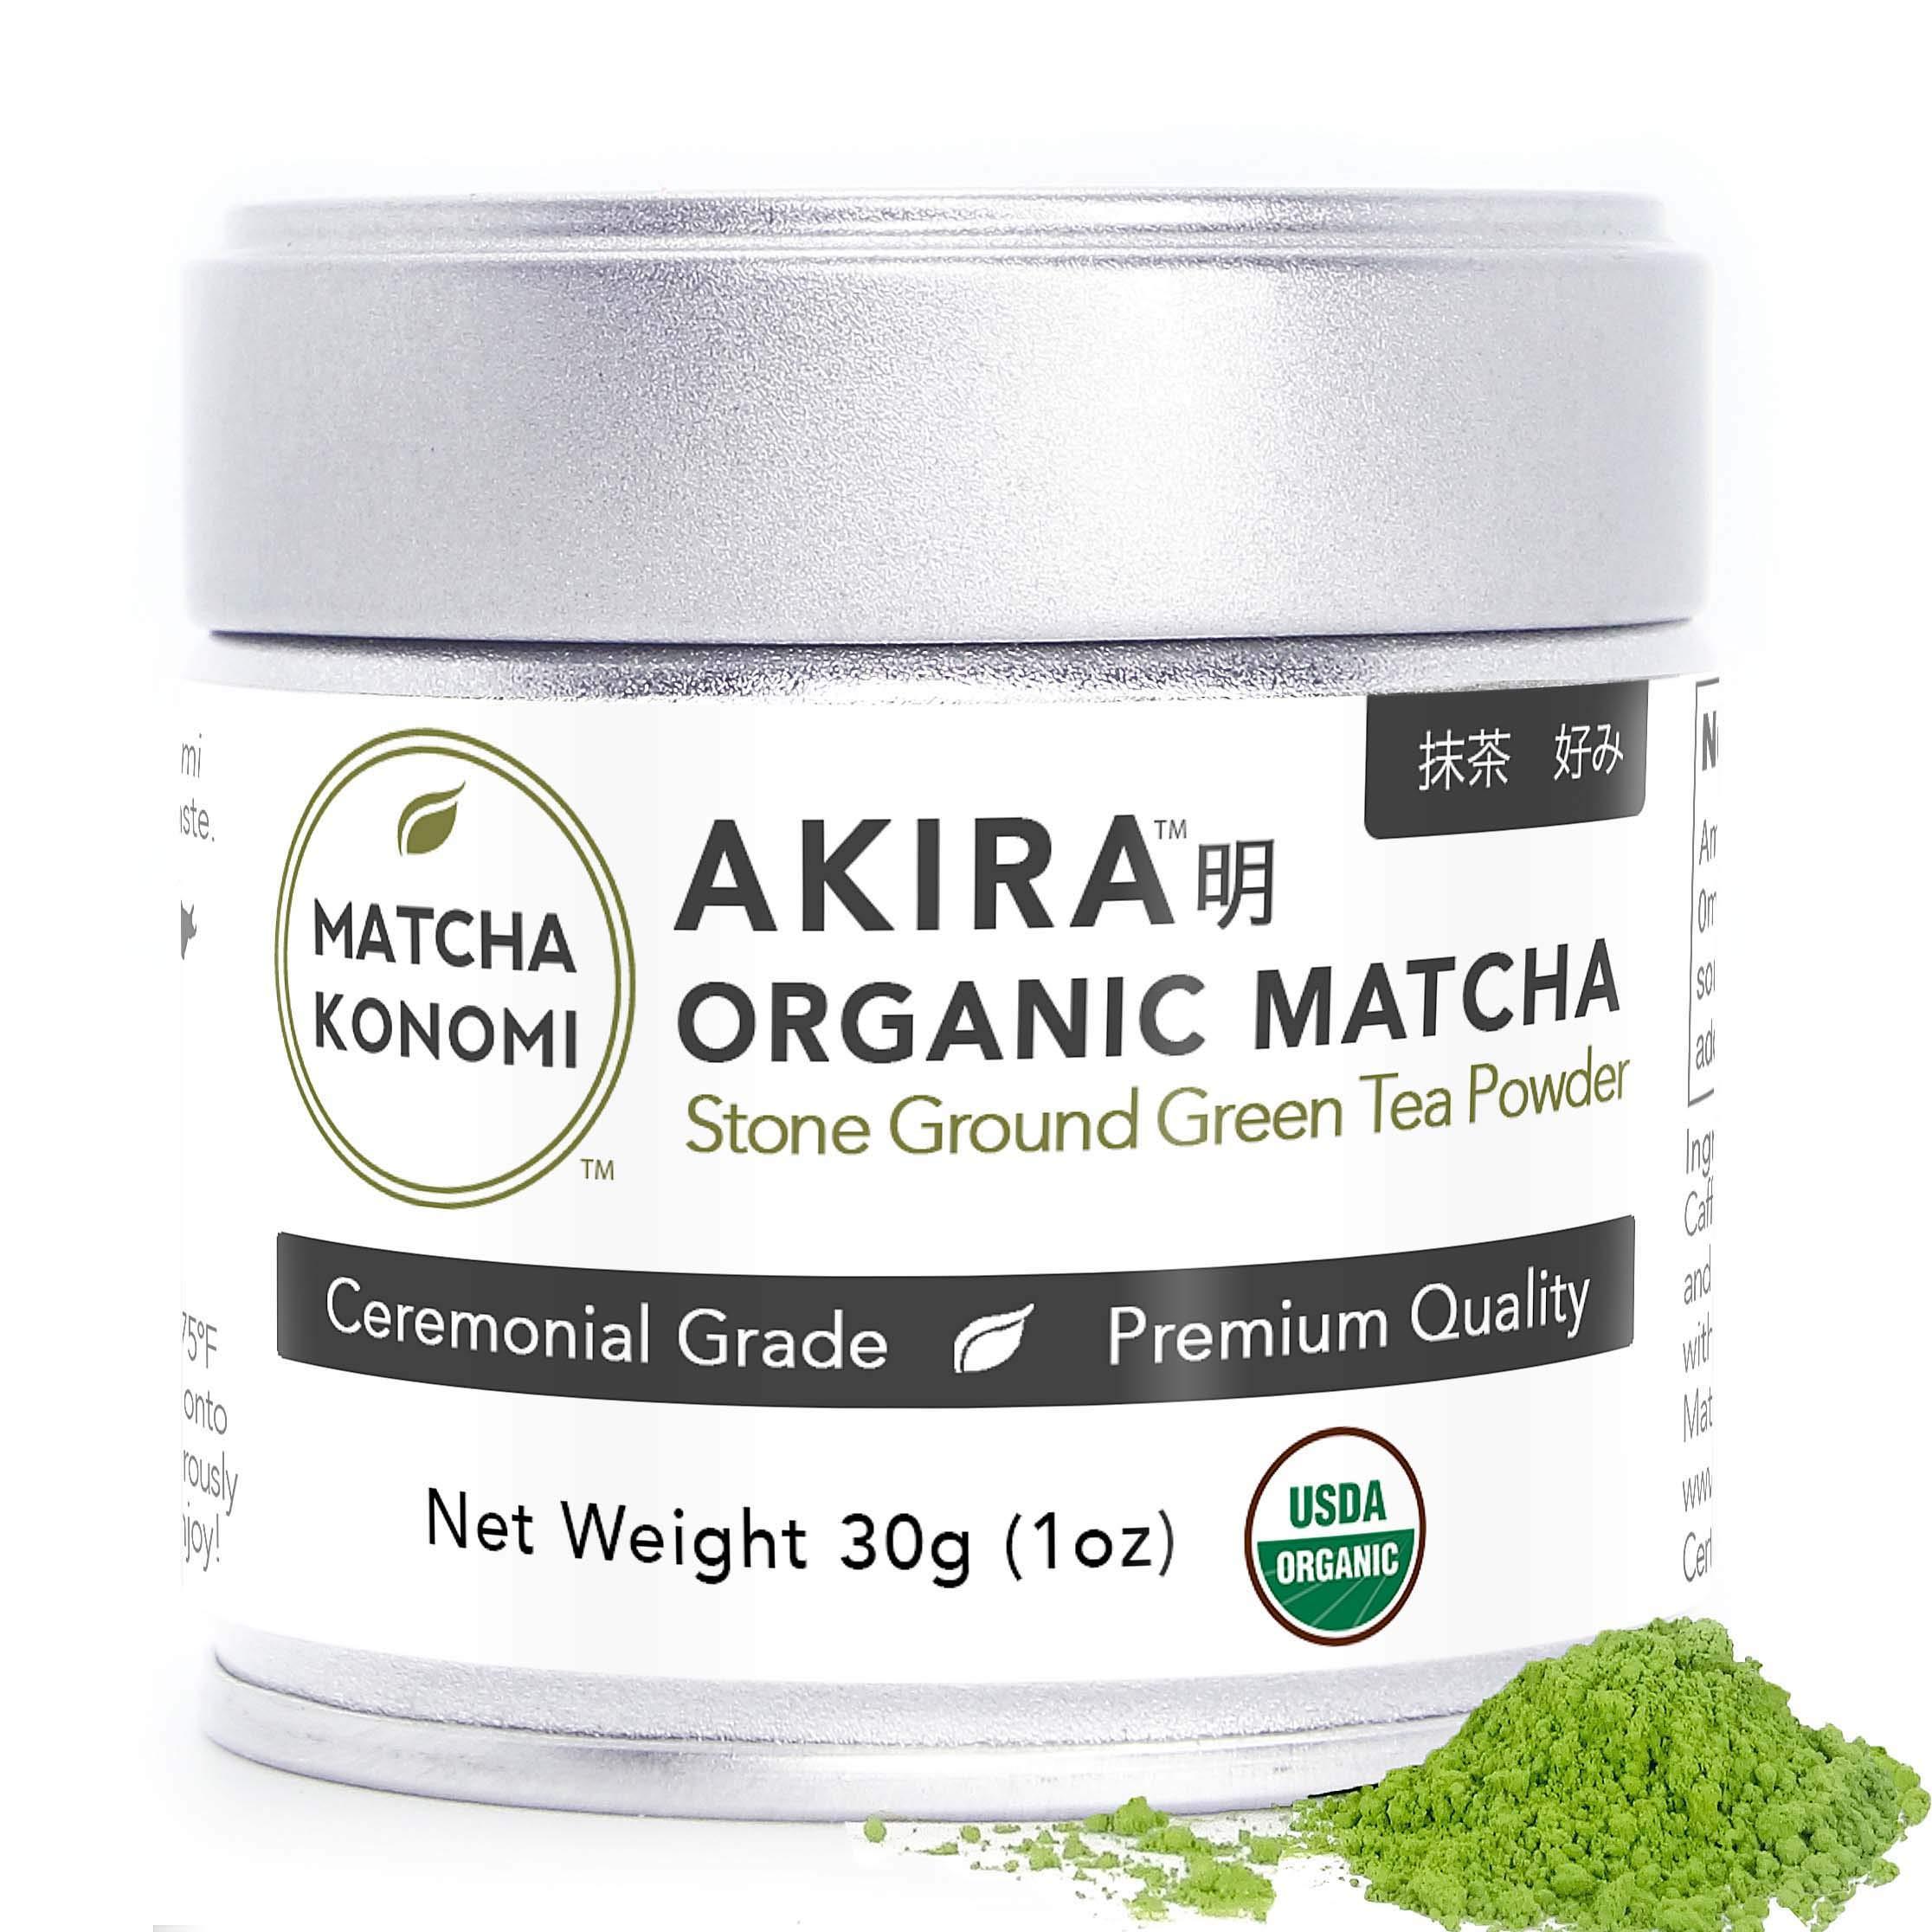 Akira Matcha 30g - Organic Premium Ceremonial Japanese Matcha Green Tea Powder - First Harvest, Radiation Free, No Additives, Zero Sugar - USDA and JAS Certified(1oz tin) by Matcha Konomi